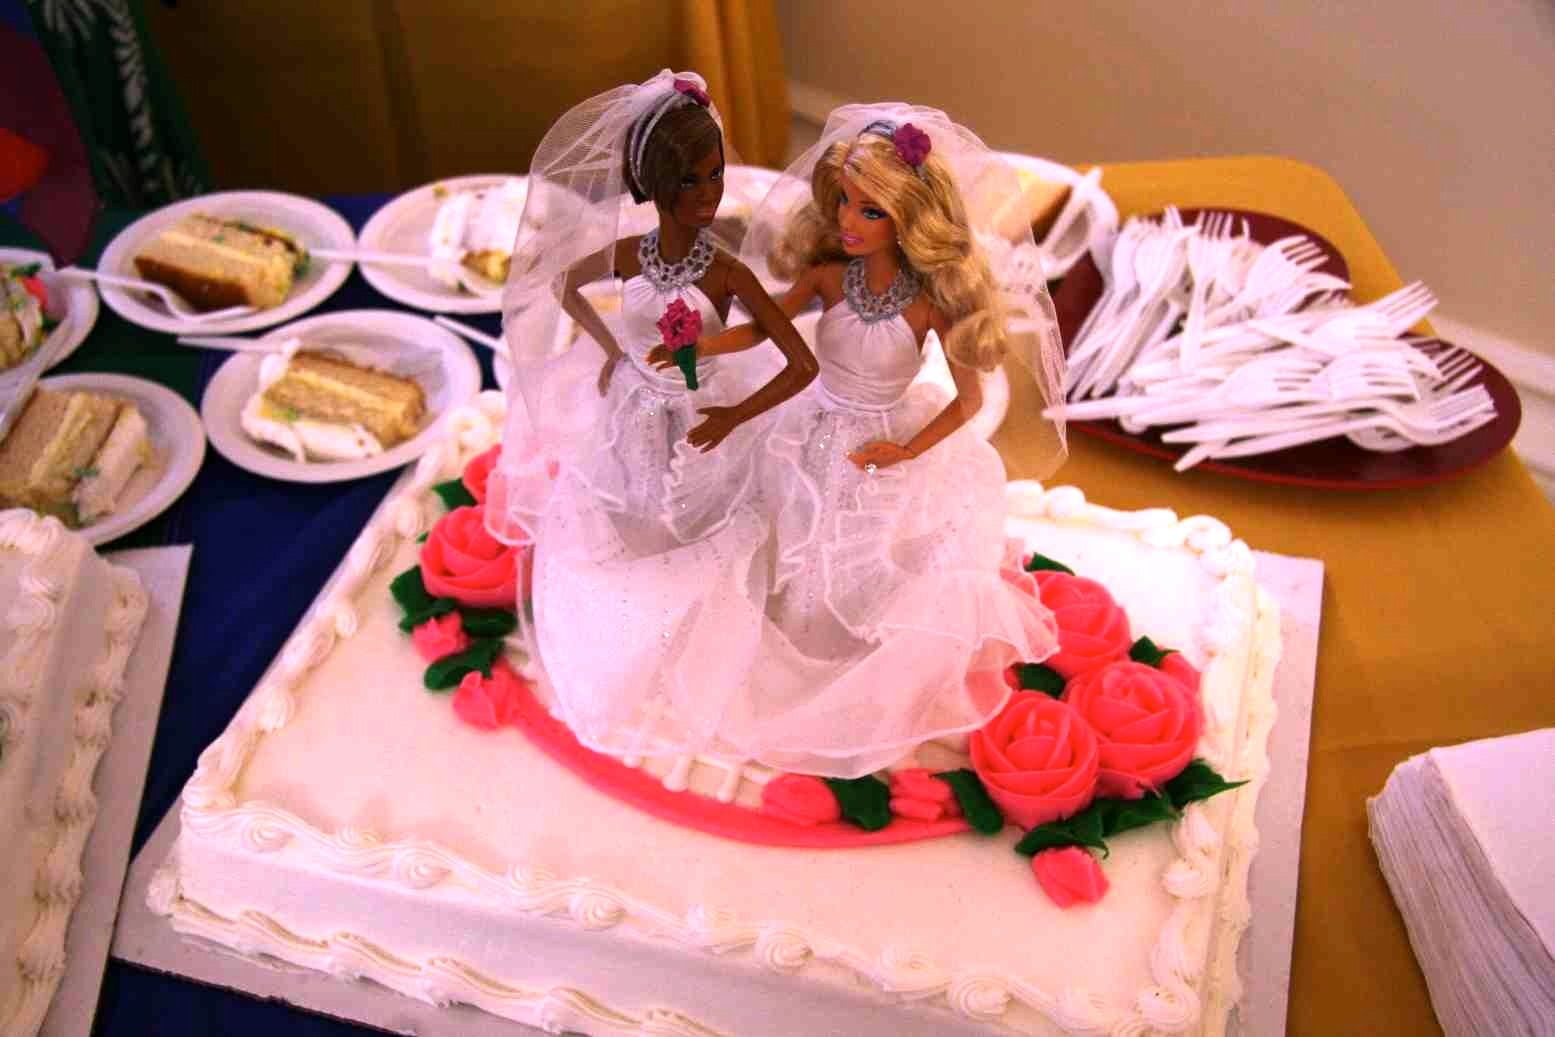 Lovely lesbian wedding cake | Gay wedding | Pinterest